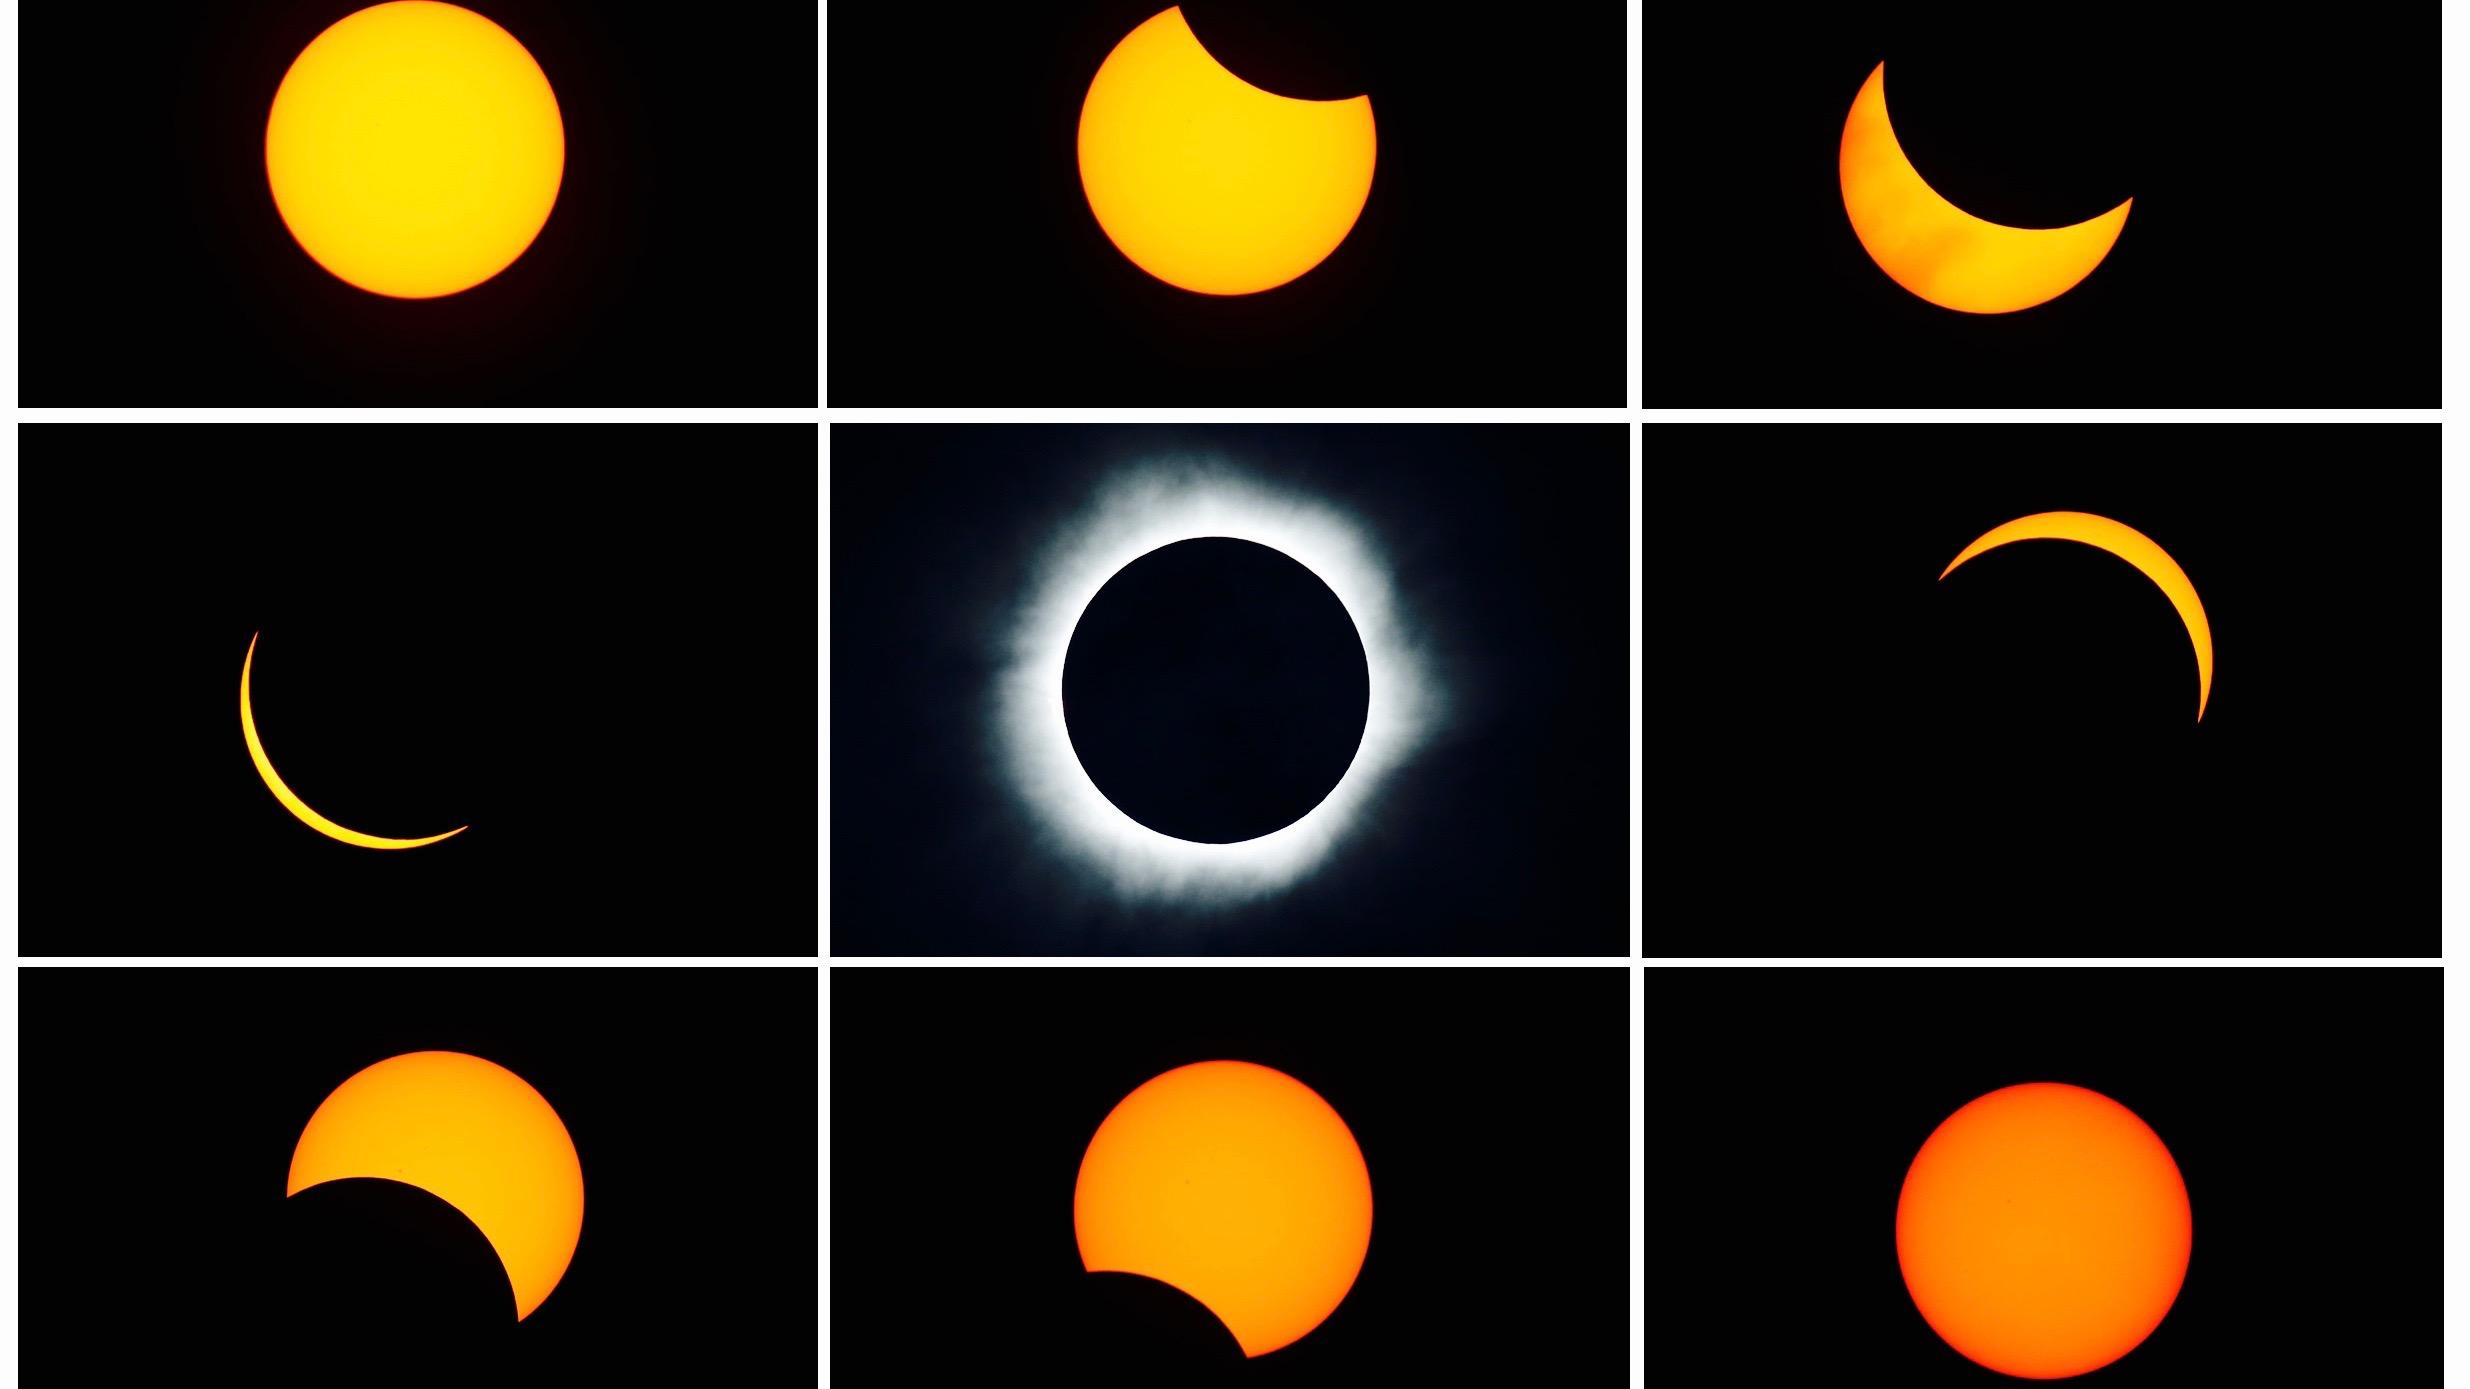 dating advice reddit 2017 eclipse glasses: